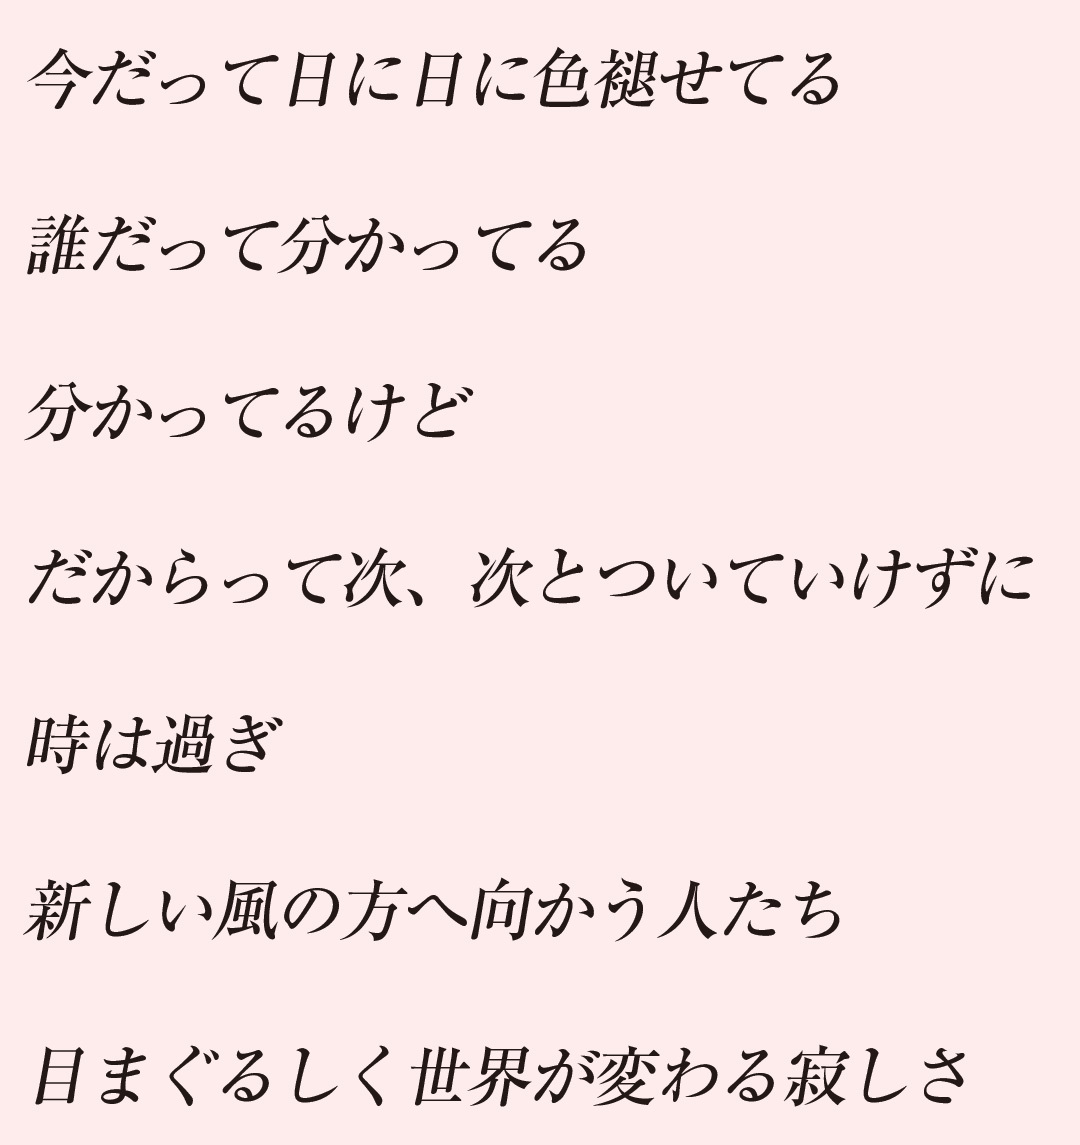 Kitriの『Akari』を読み解く!【ヒャダインのこの歌詞がすげえ!】_1_2